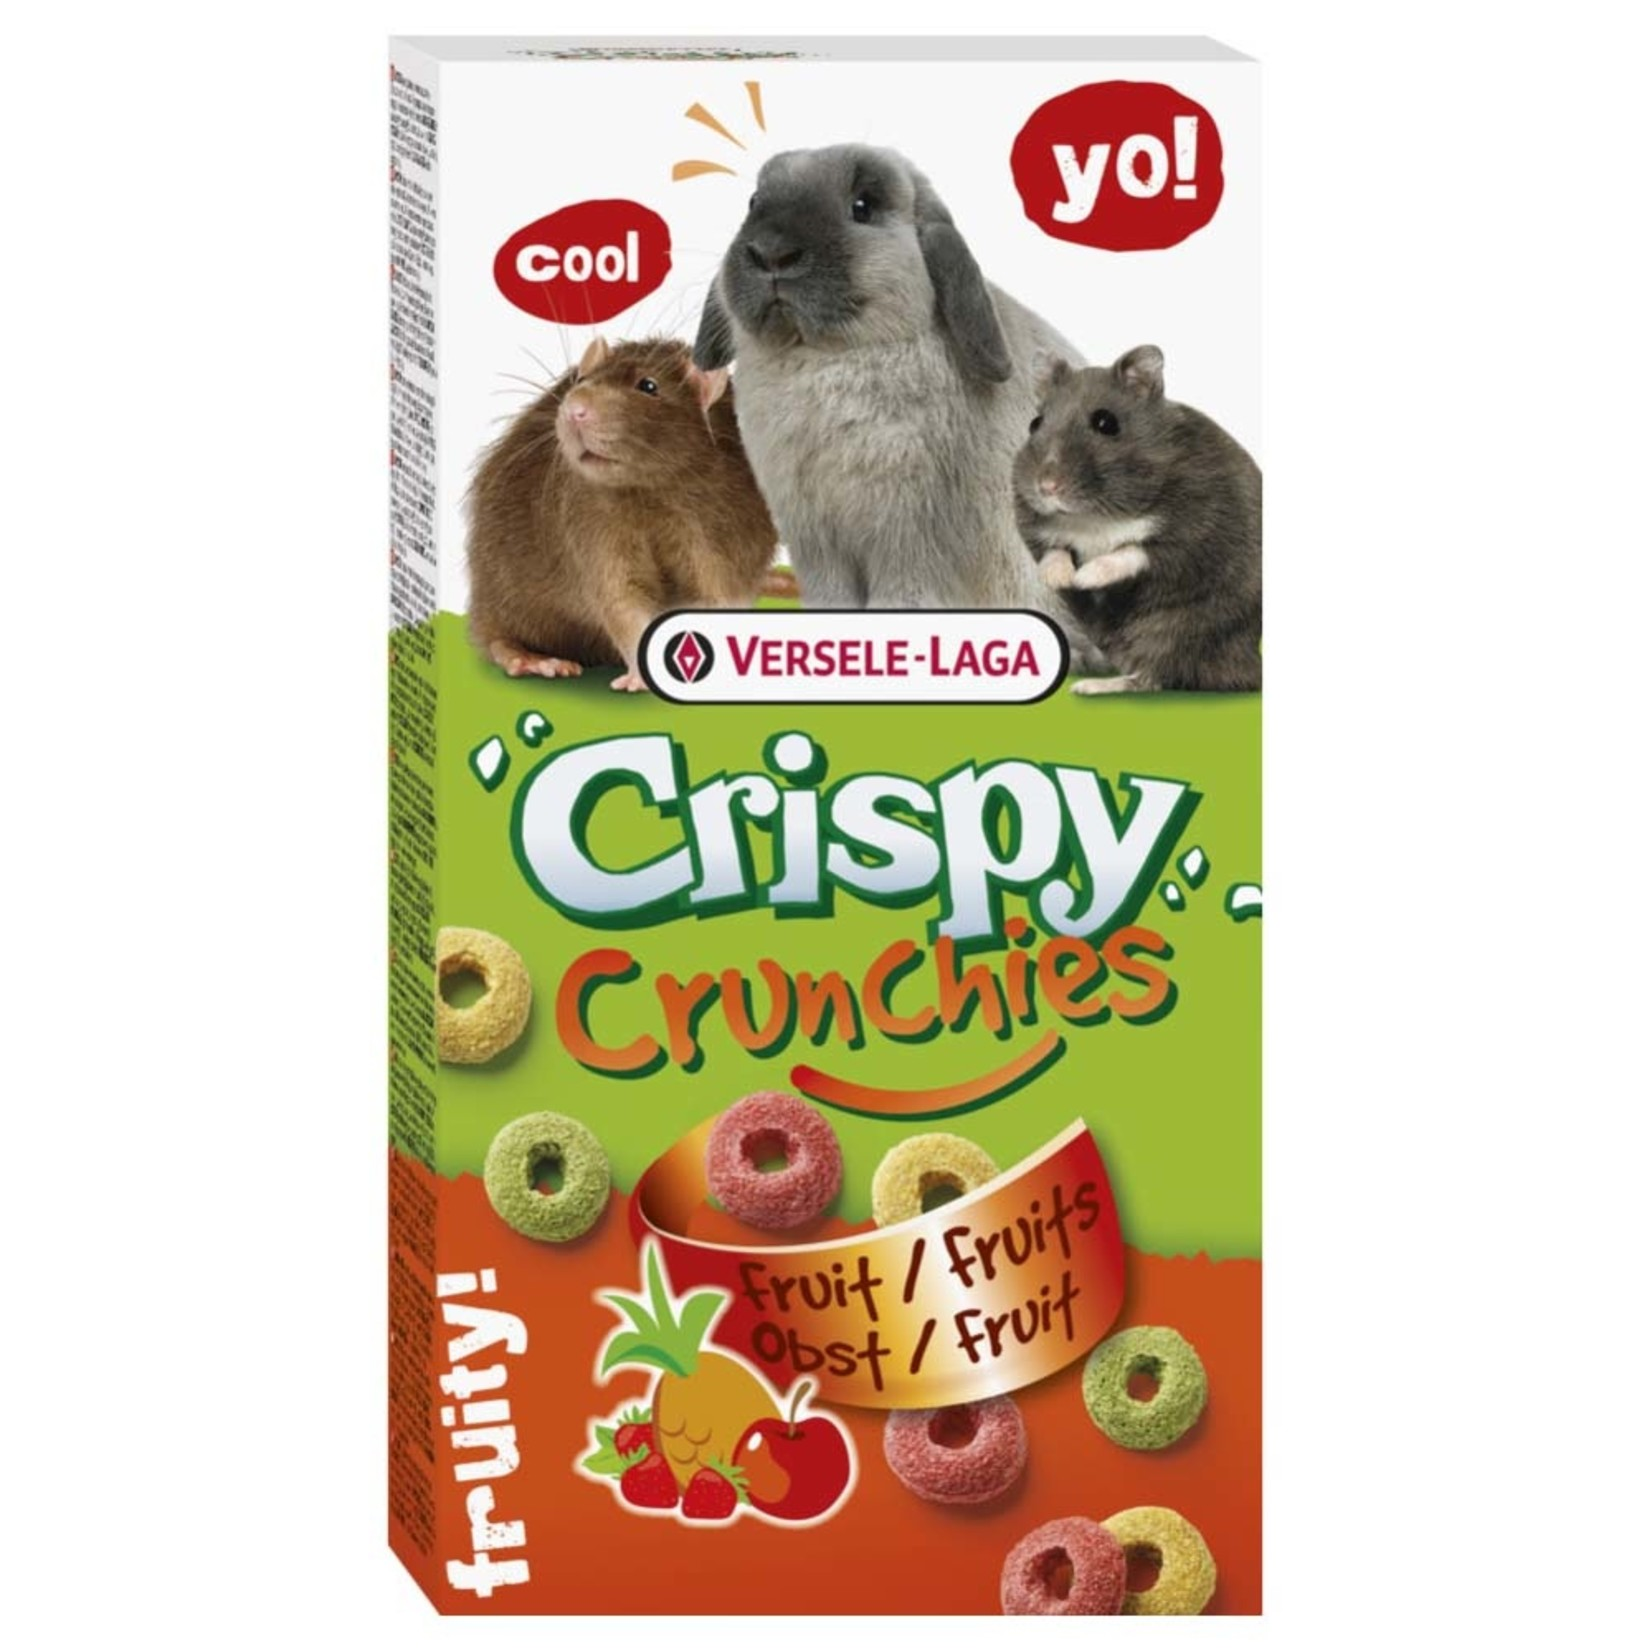 Versele-Laga Crispy Crunchies fruits for small animal 75g